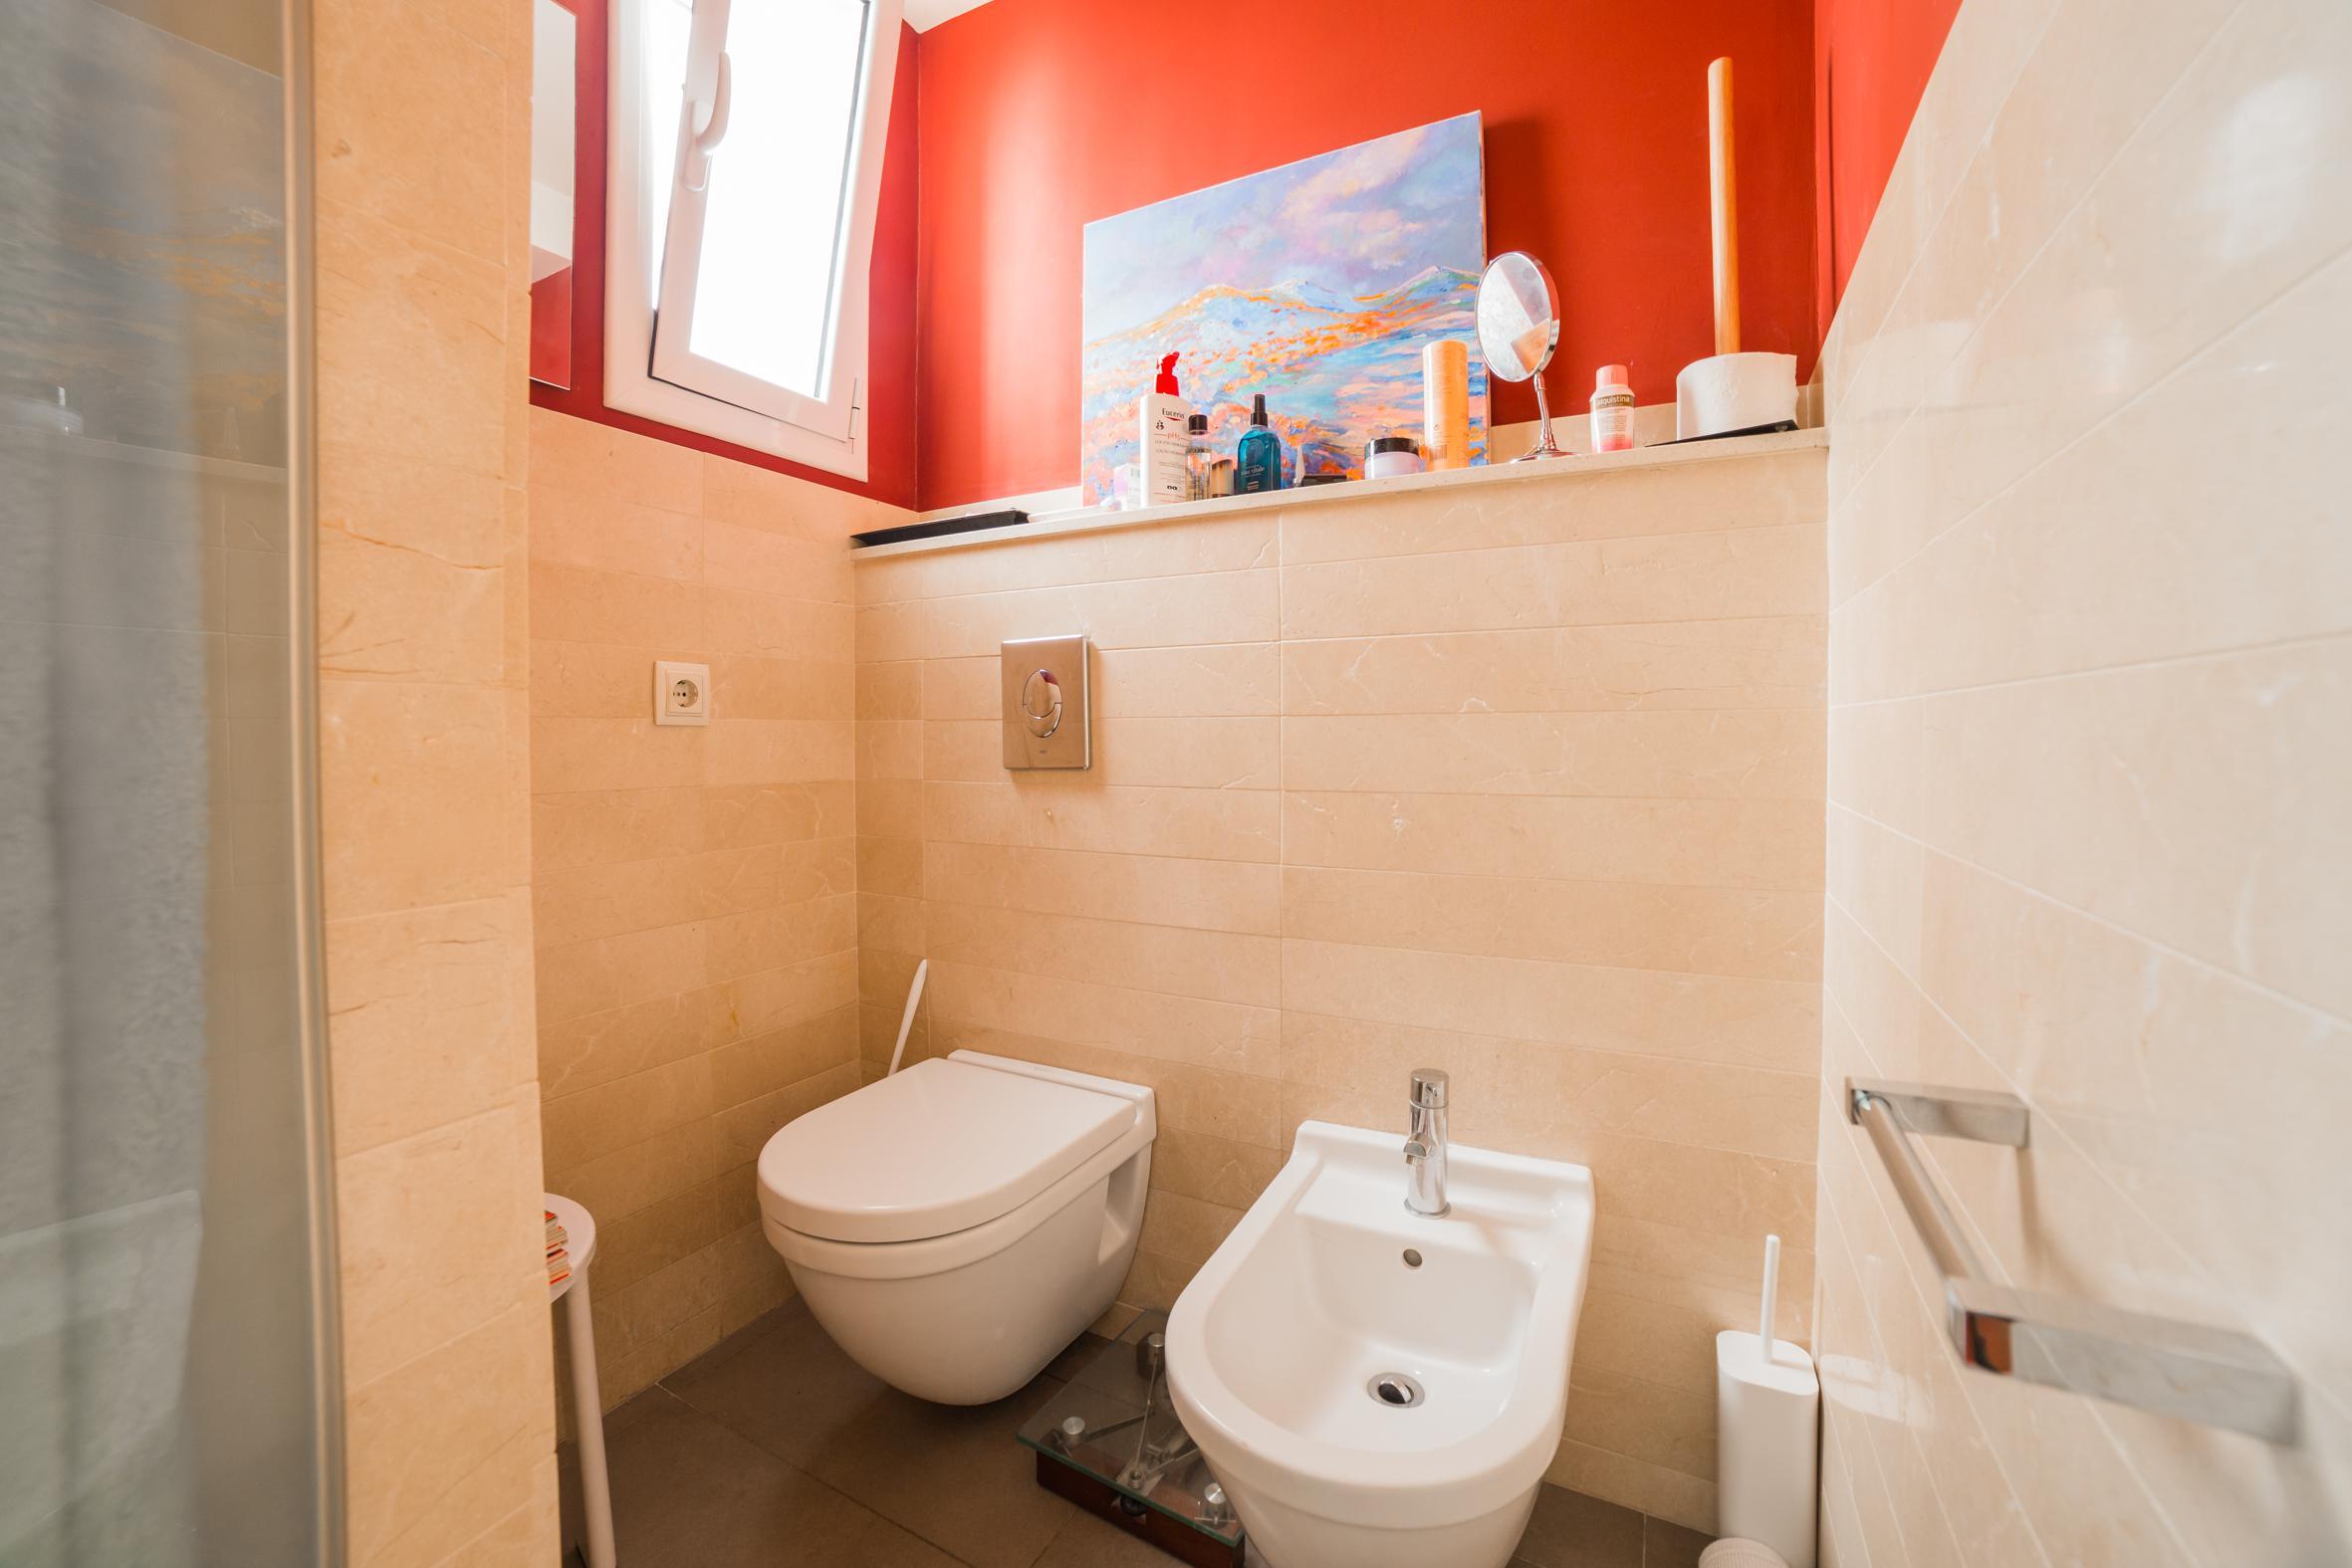 253515 Apartamento en venta en Sarrià-Sant Gervasi, Sant Gervasi-Galvany 19